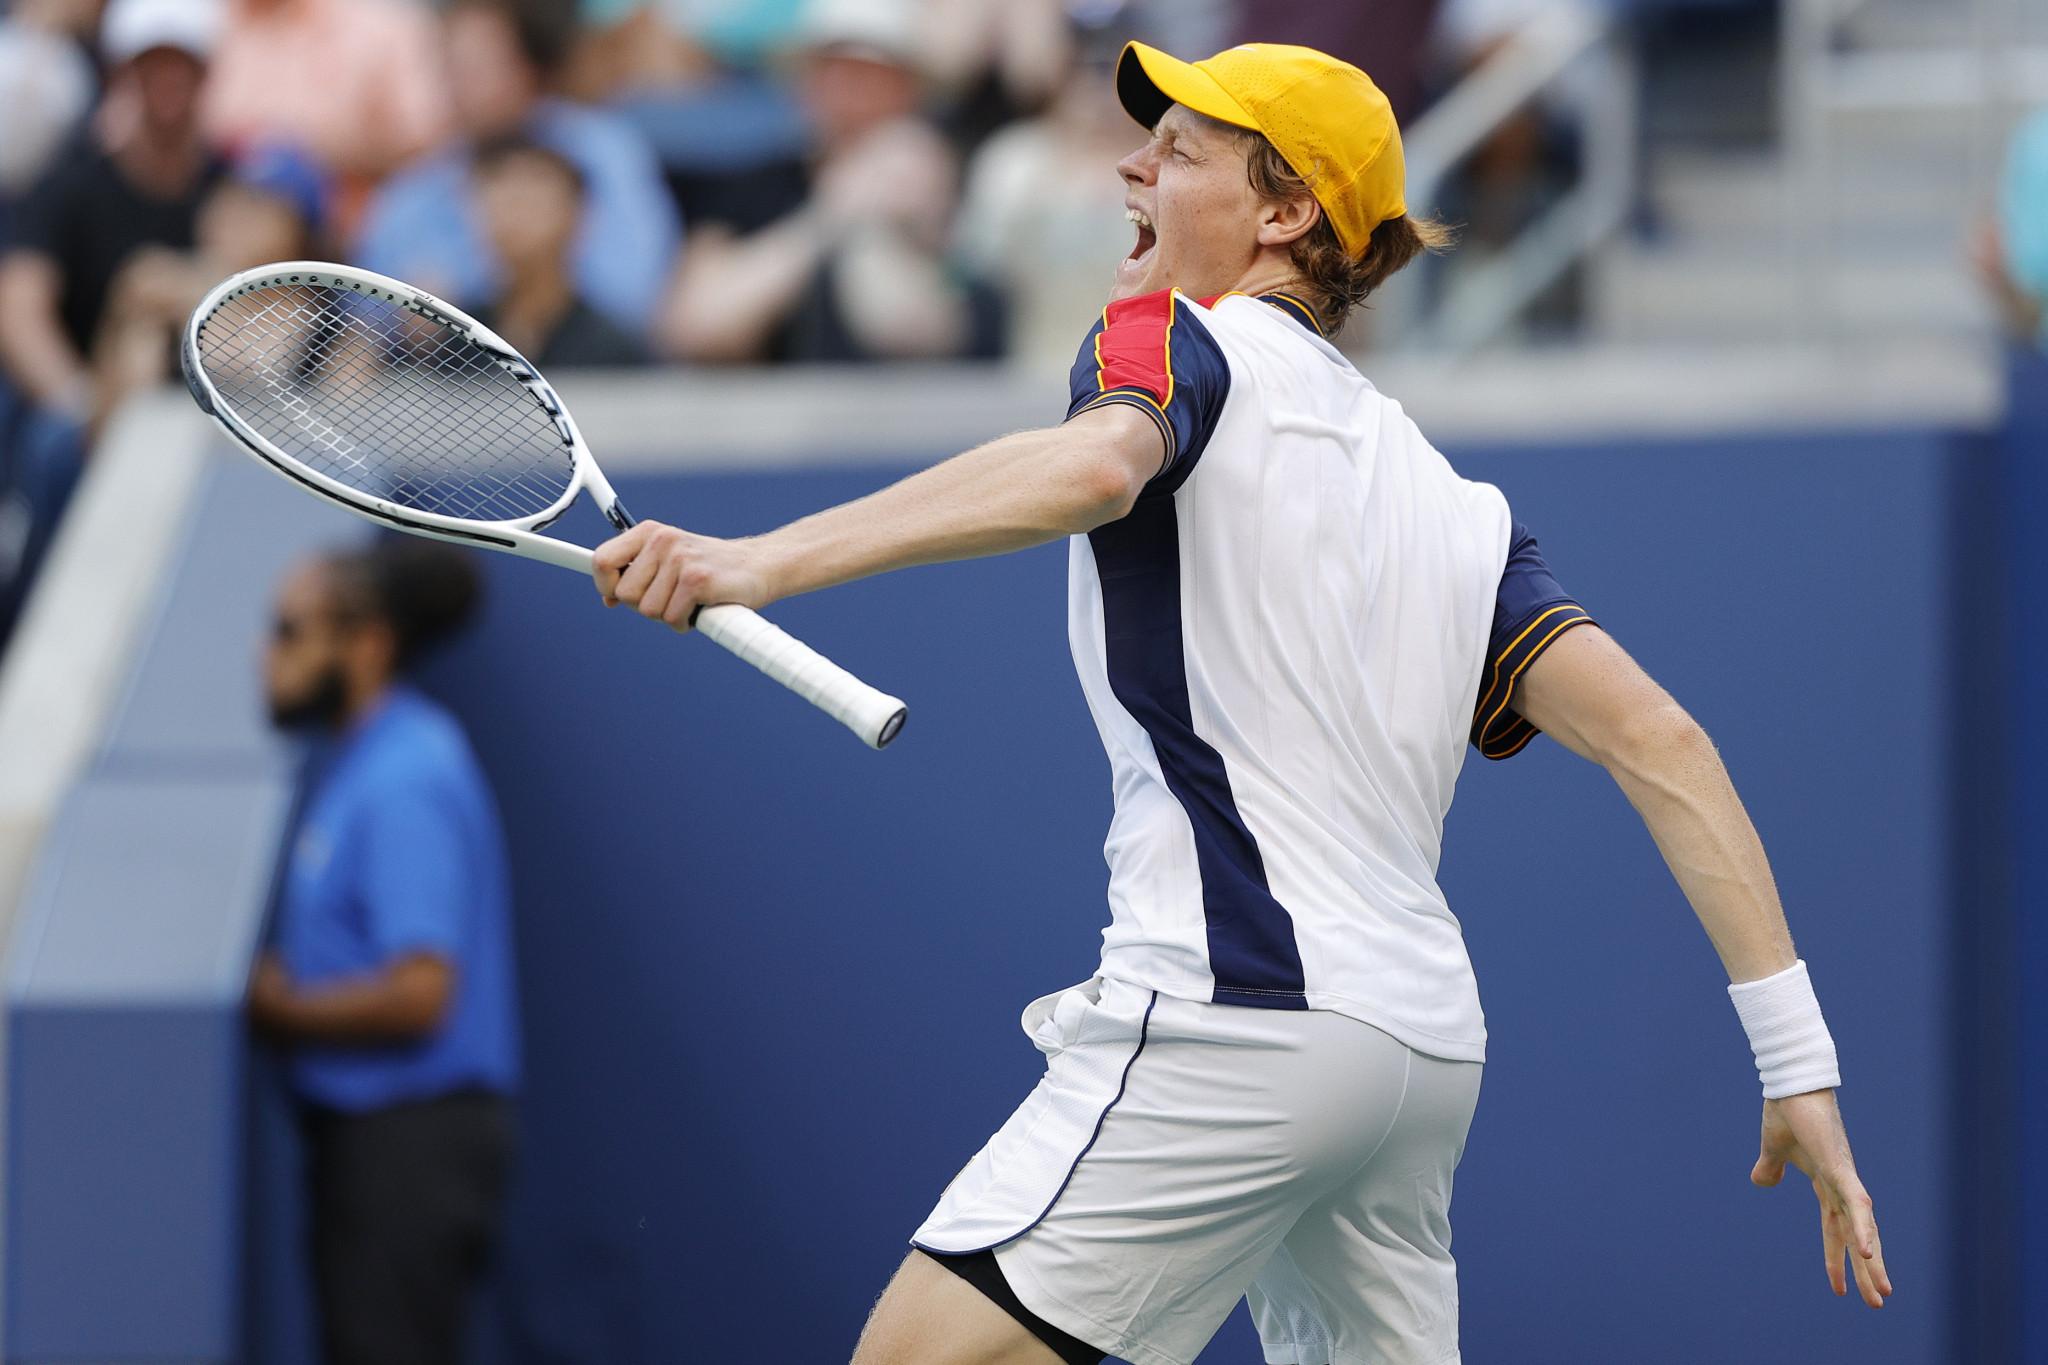 Jannik Sinner celebrates his five-set win over Gael Monfils ©Getty Images